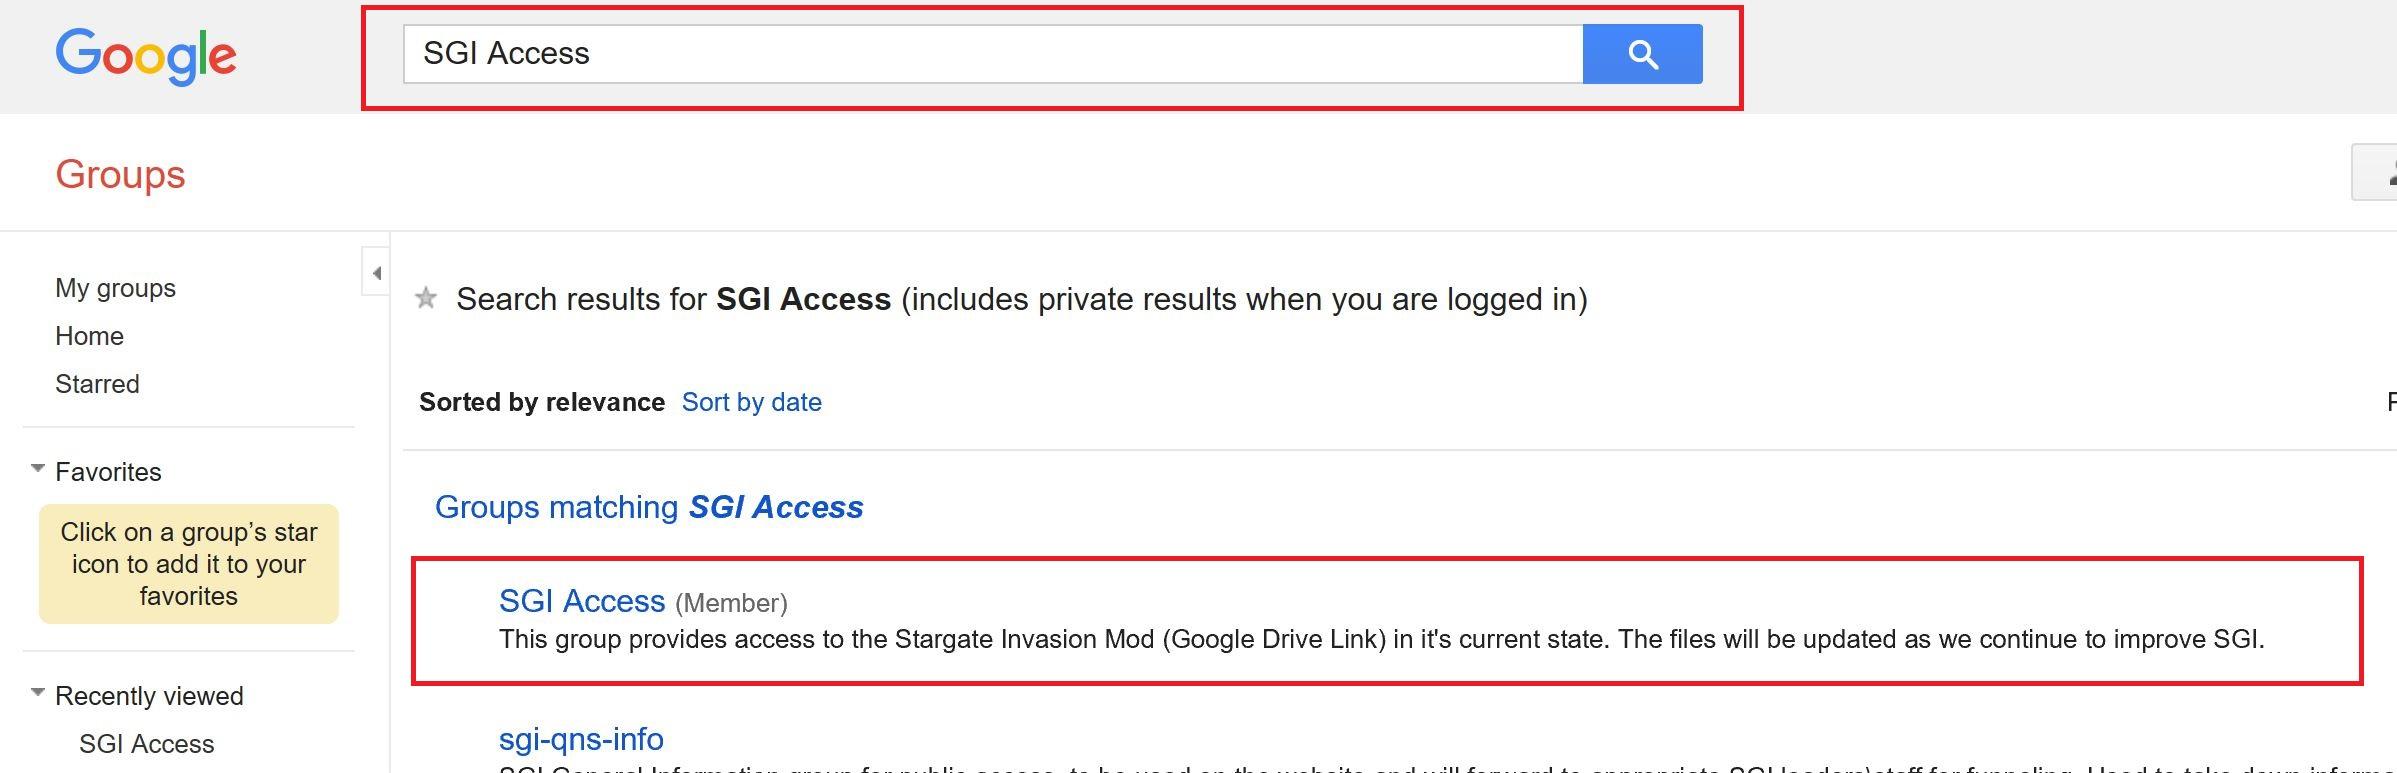 Search for SGI Access on Google